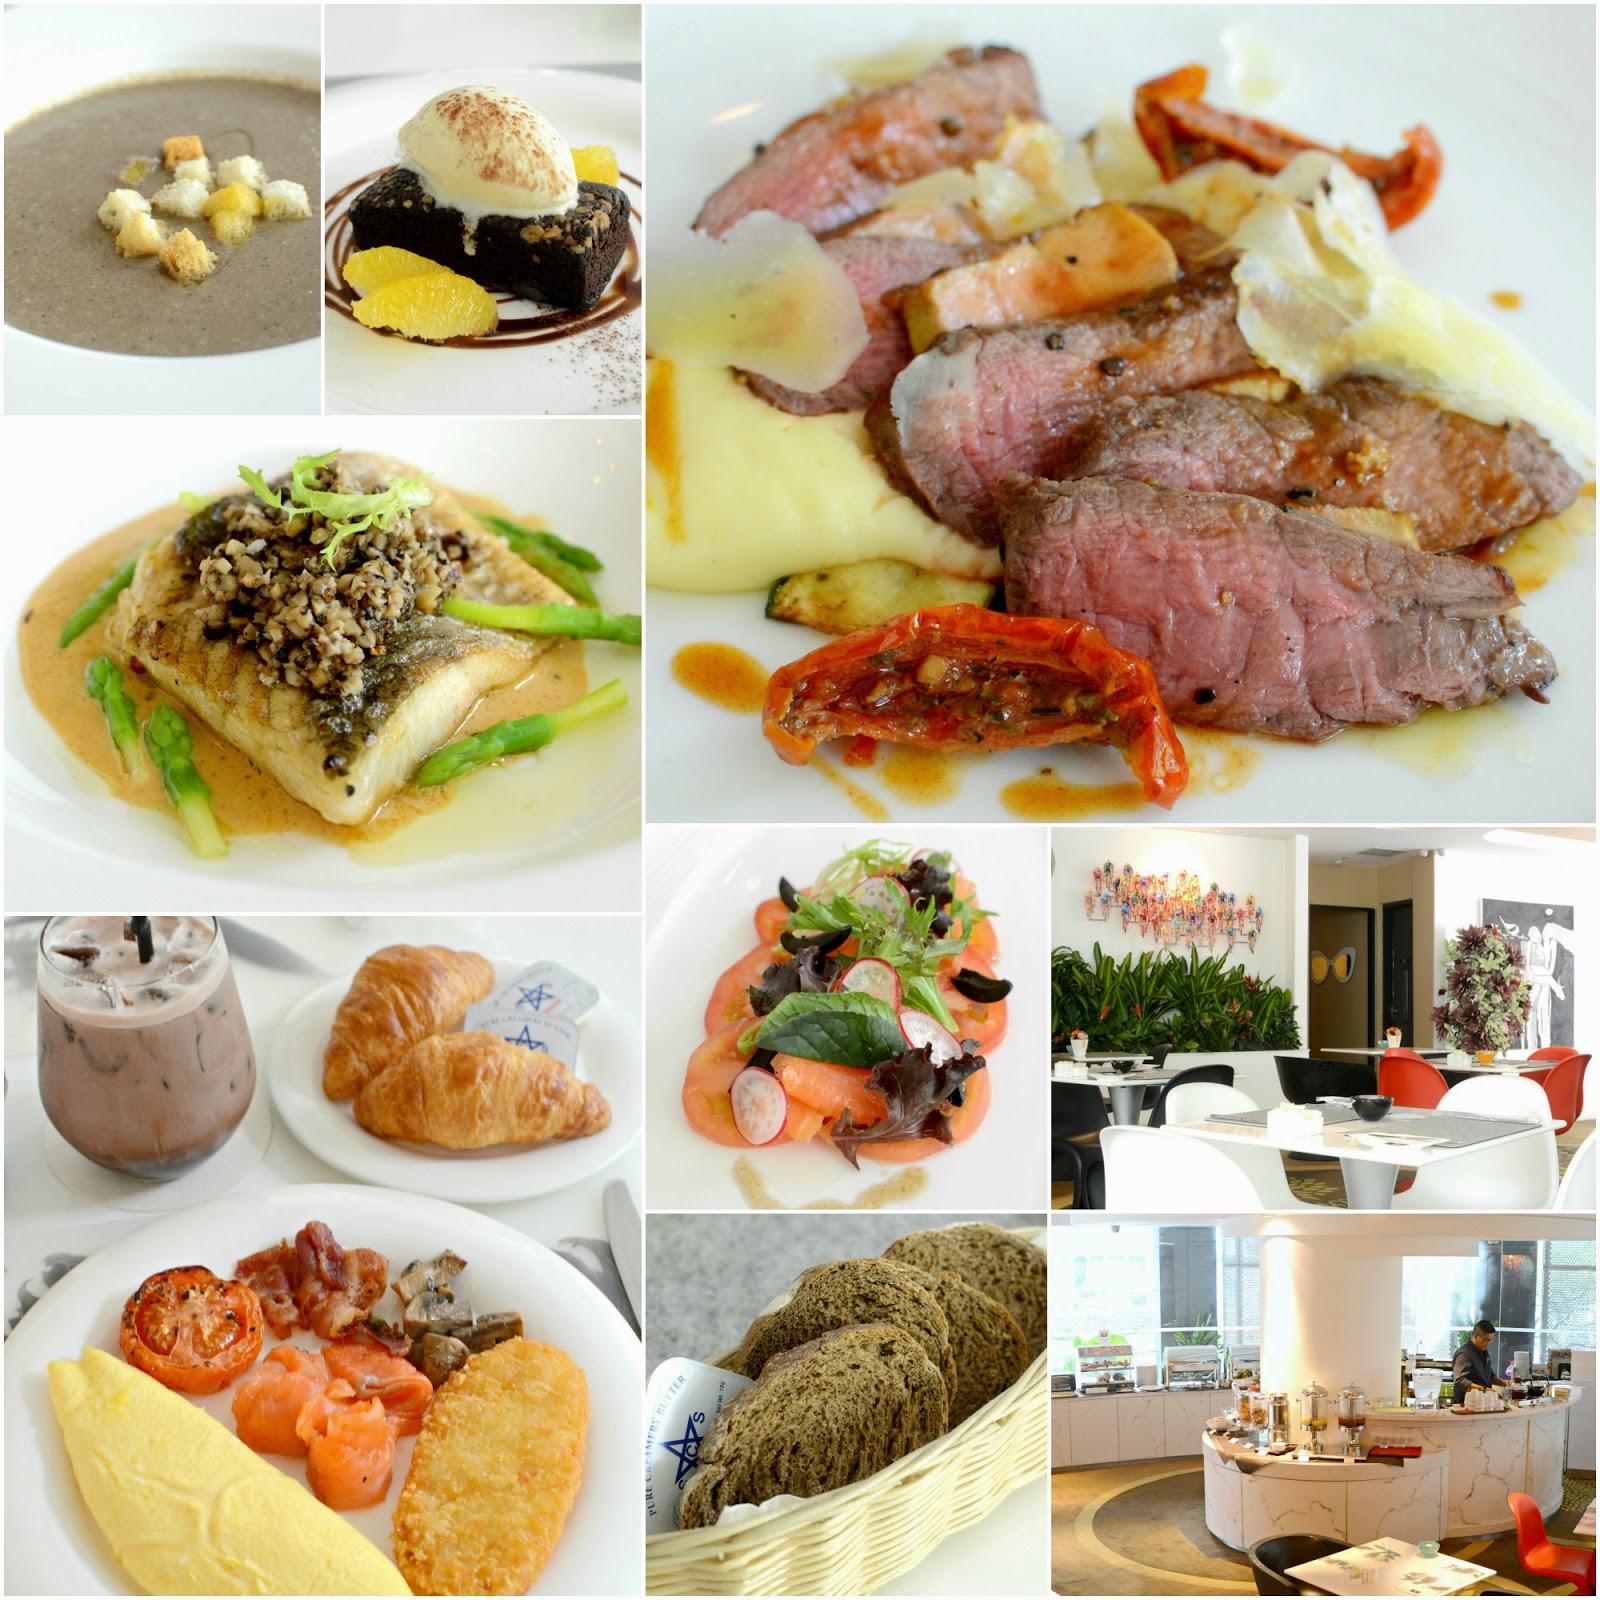 http://www.chocolatemuimui.com/2015/04/wangz-hotel-singapore-nectar.html